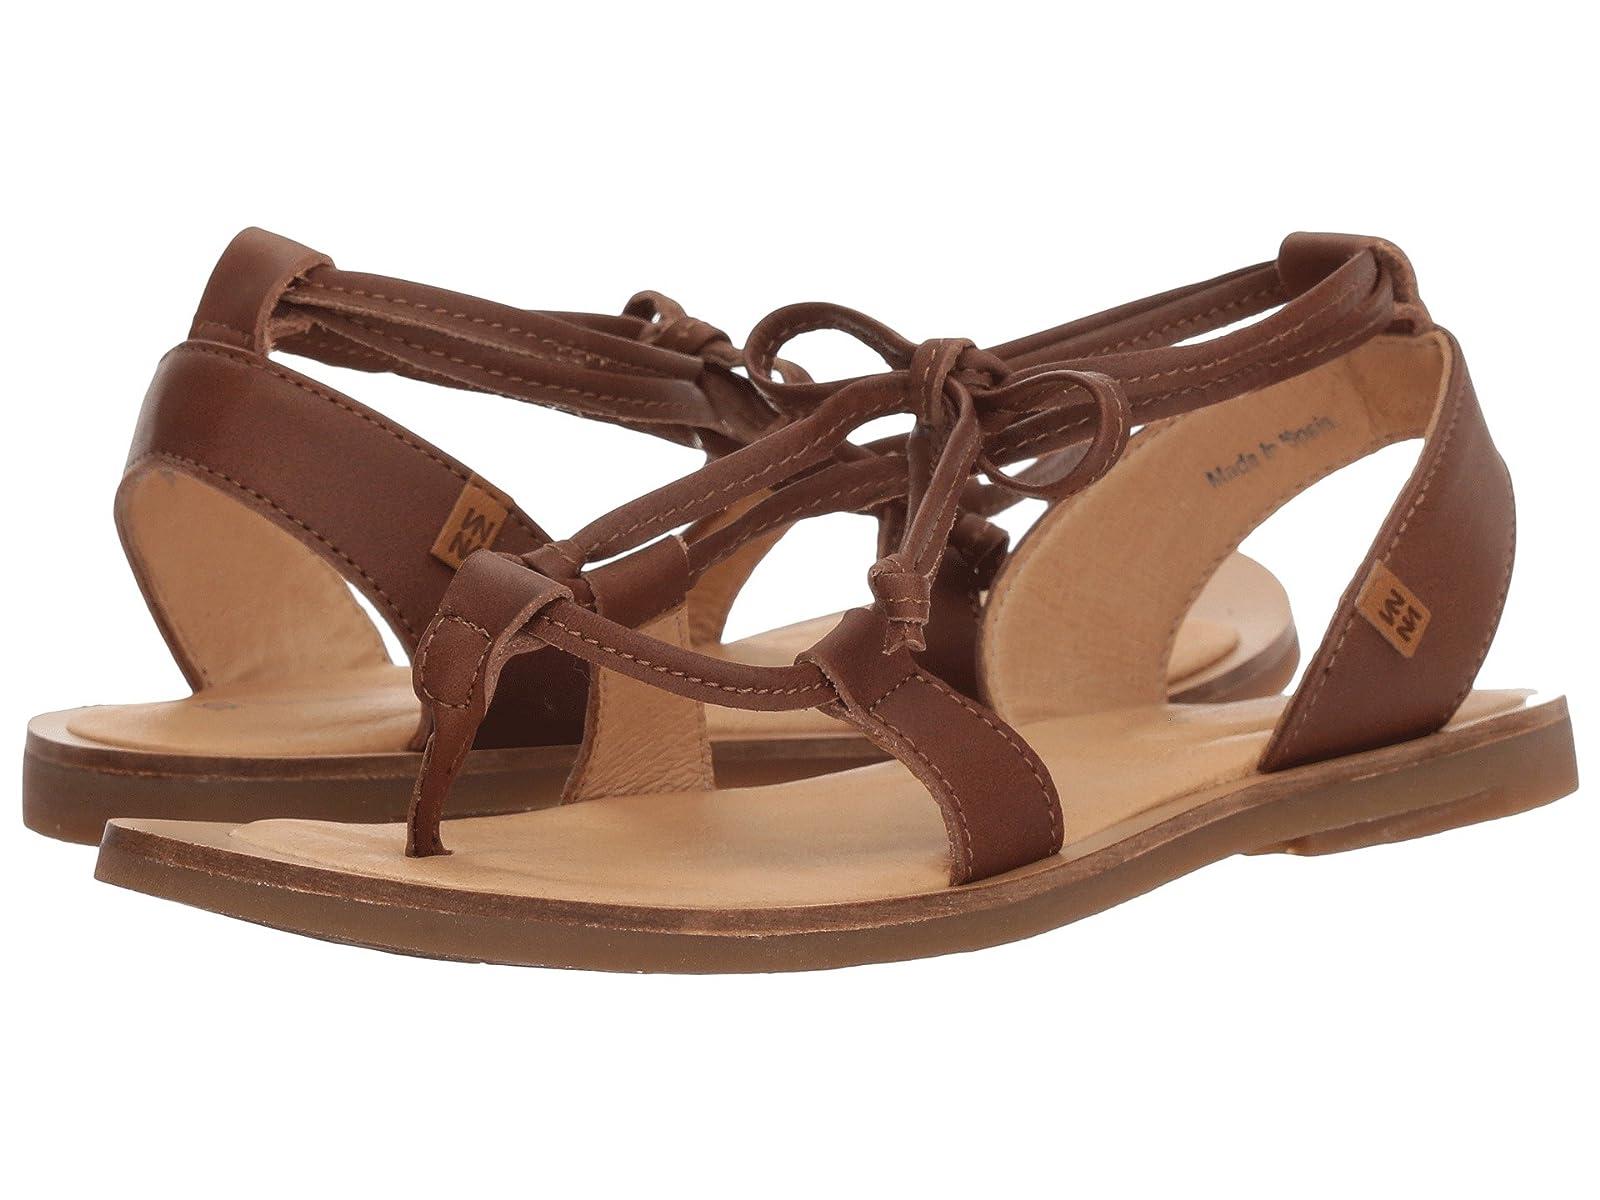 El Naturalista Tulip N5180Atmospheric grades have affordable shoes